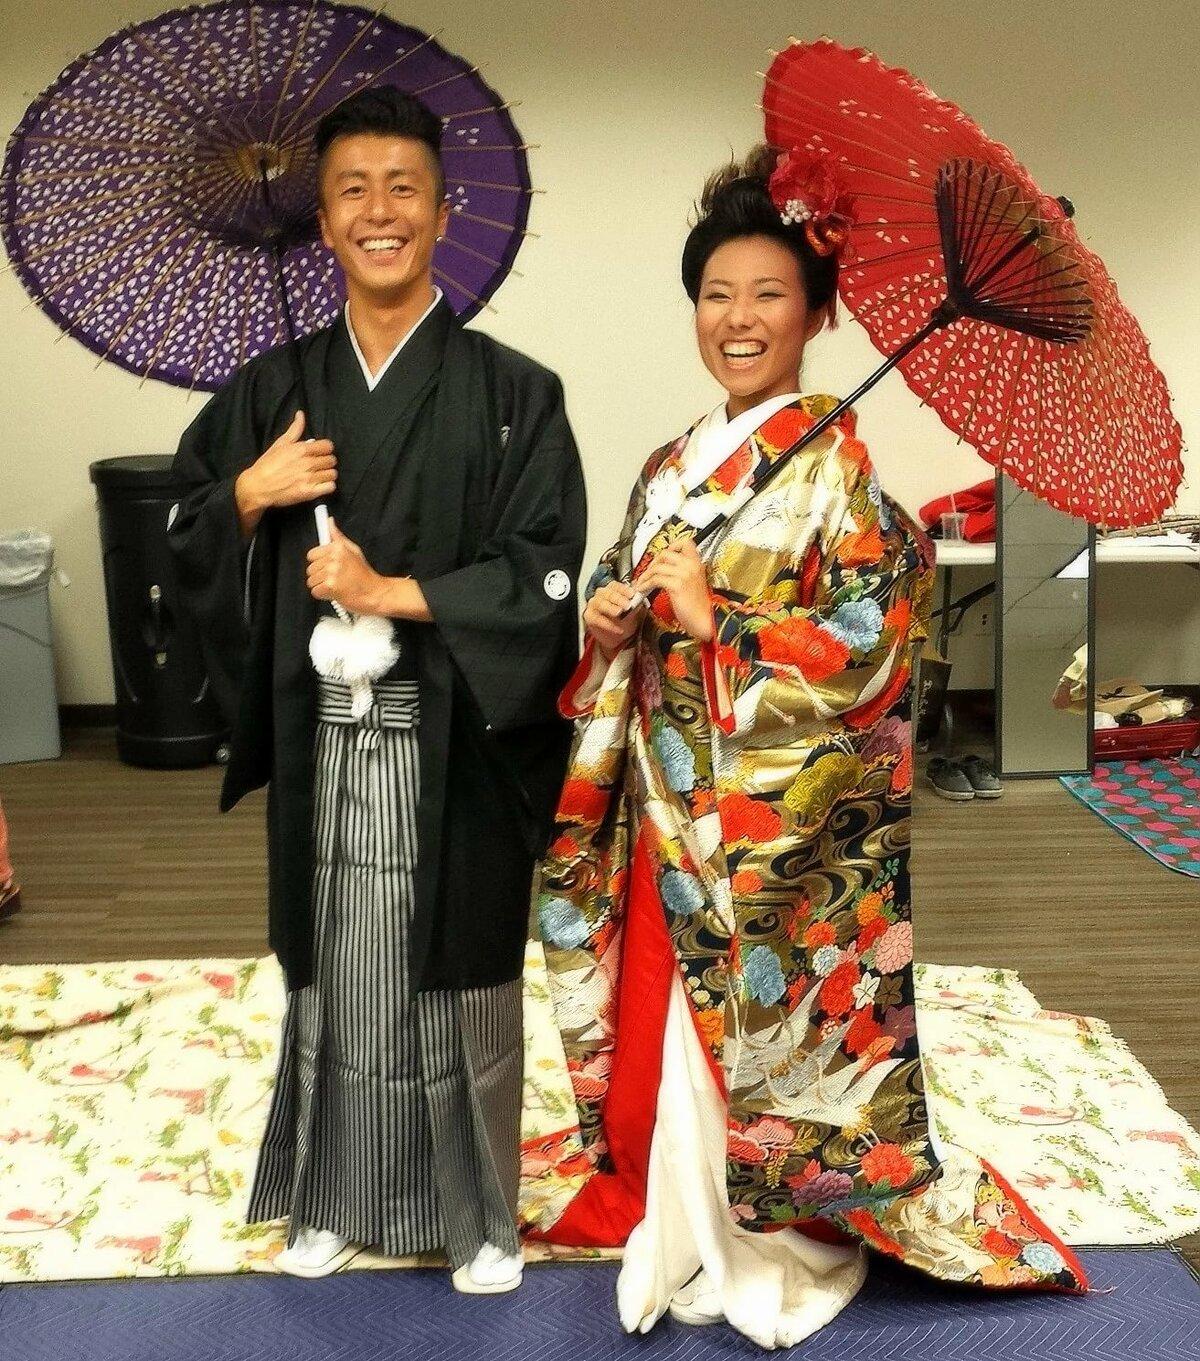 всем одежда японцев фото ней мастер кисти